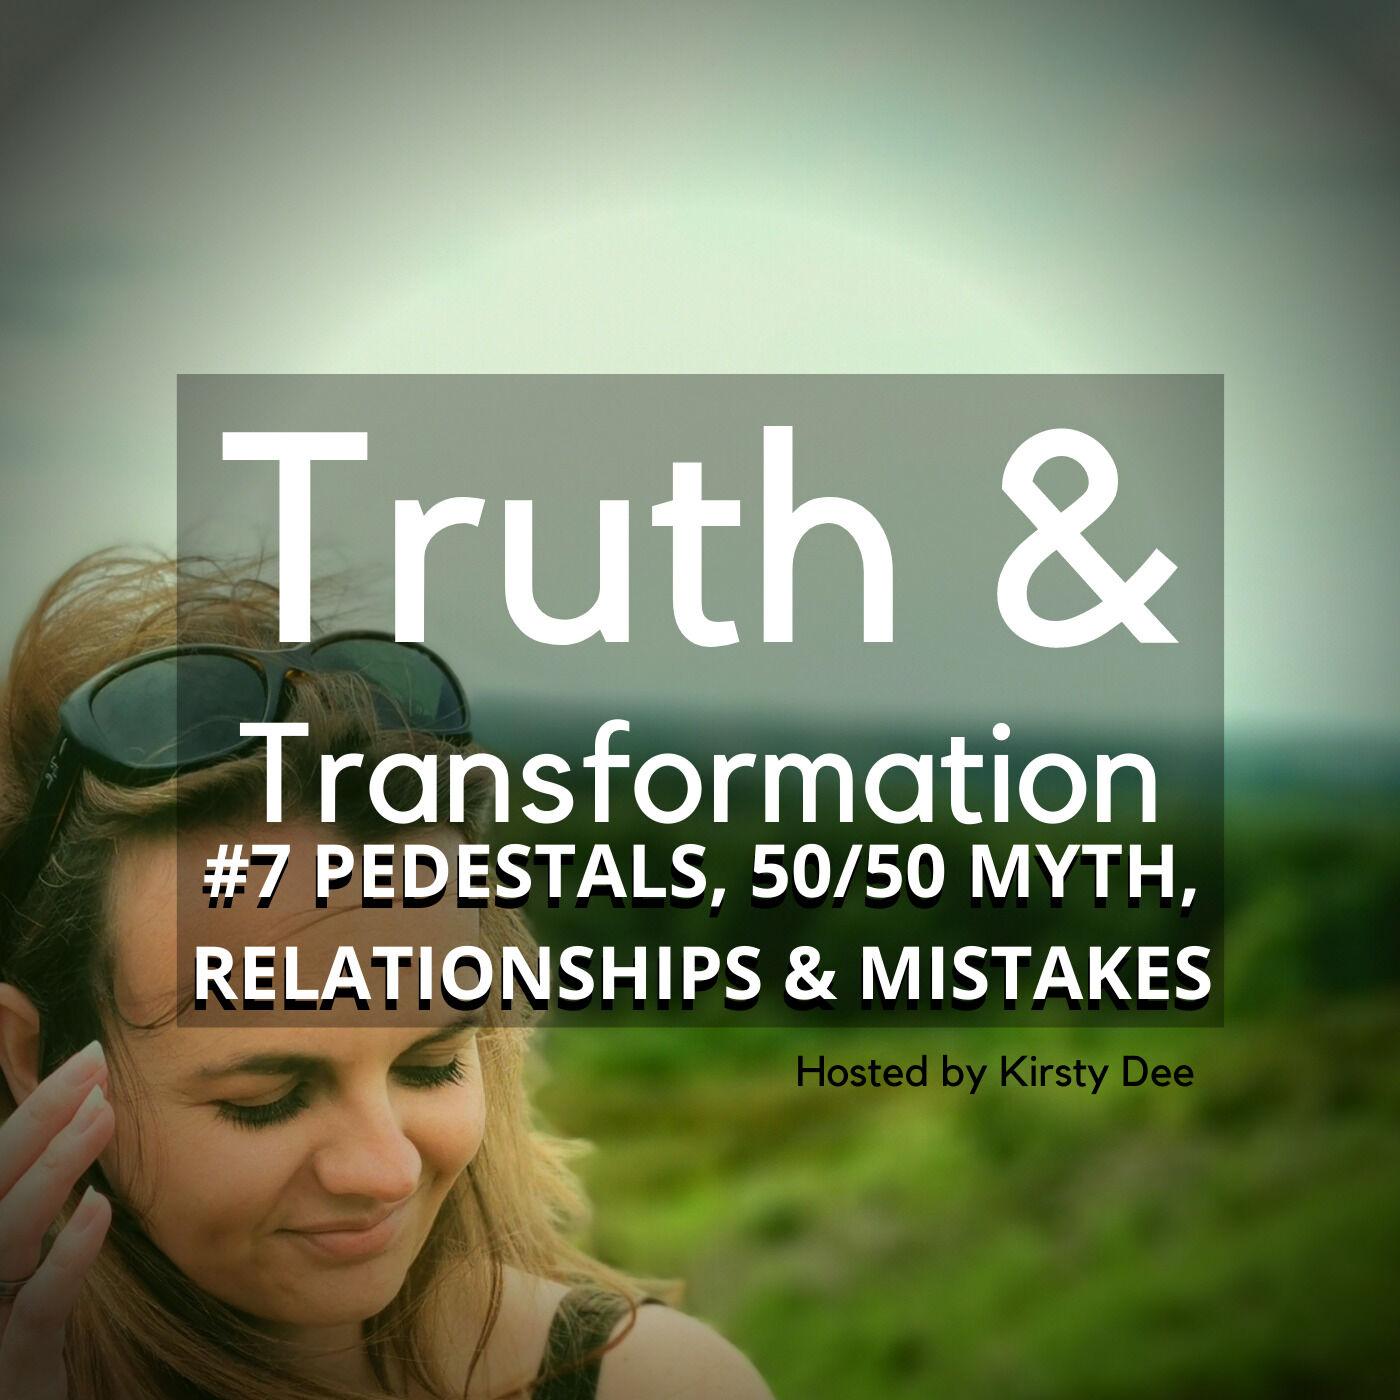 #7 PEDESTALS, 50/50 MYTH, RELATIONSHIPS & MISTAKES